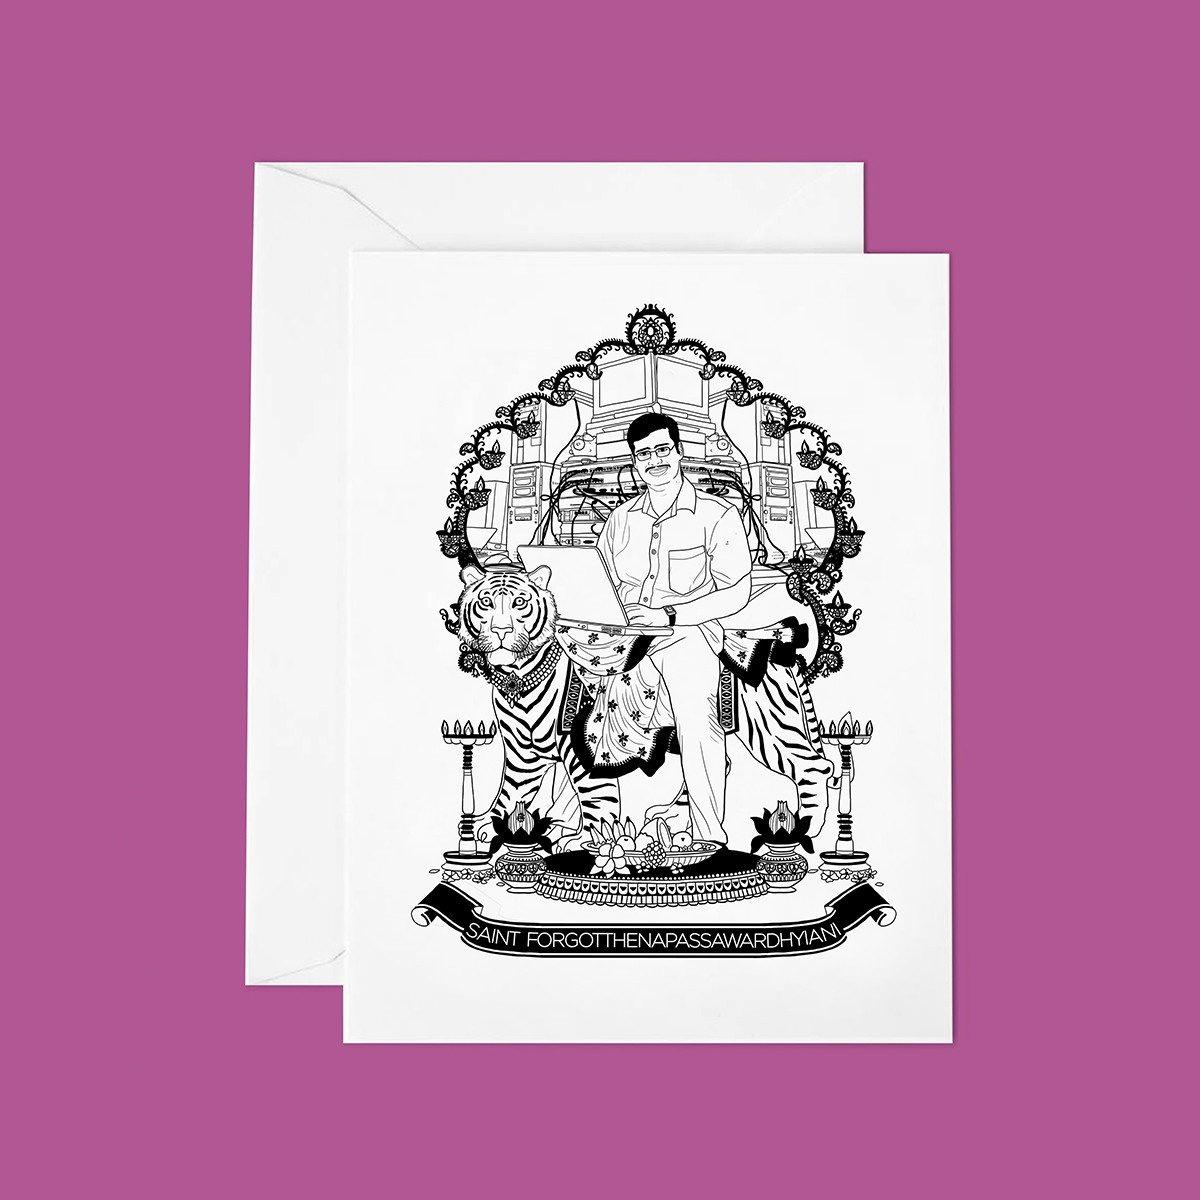 TUTTISANTI | Saint Forgotthenapasswardhyiani